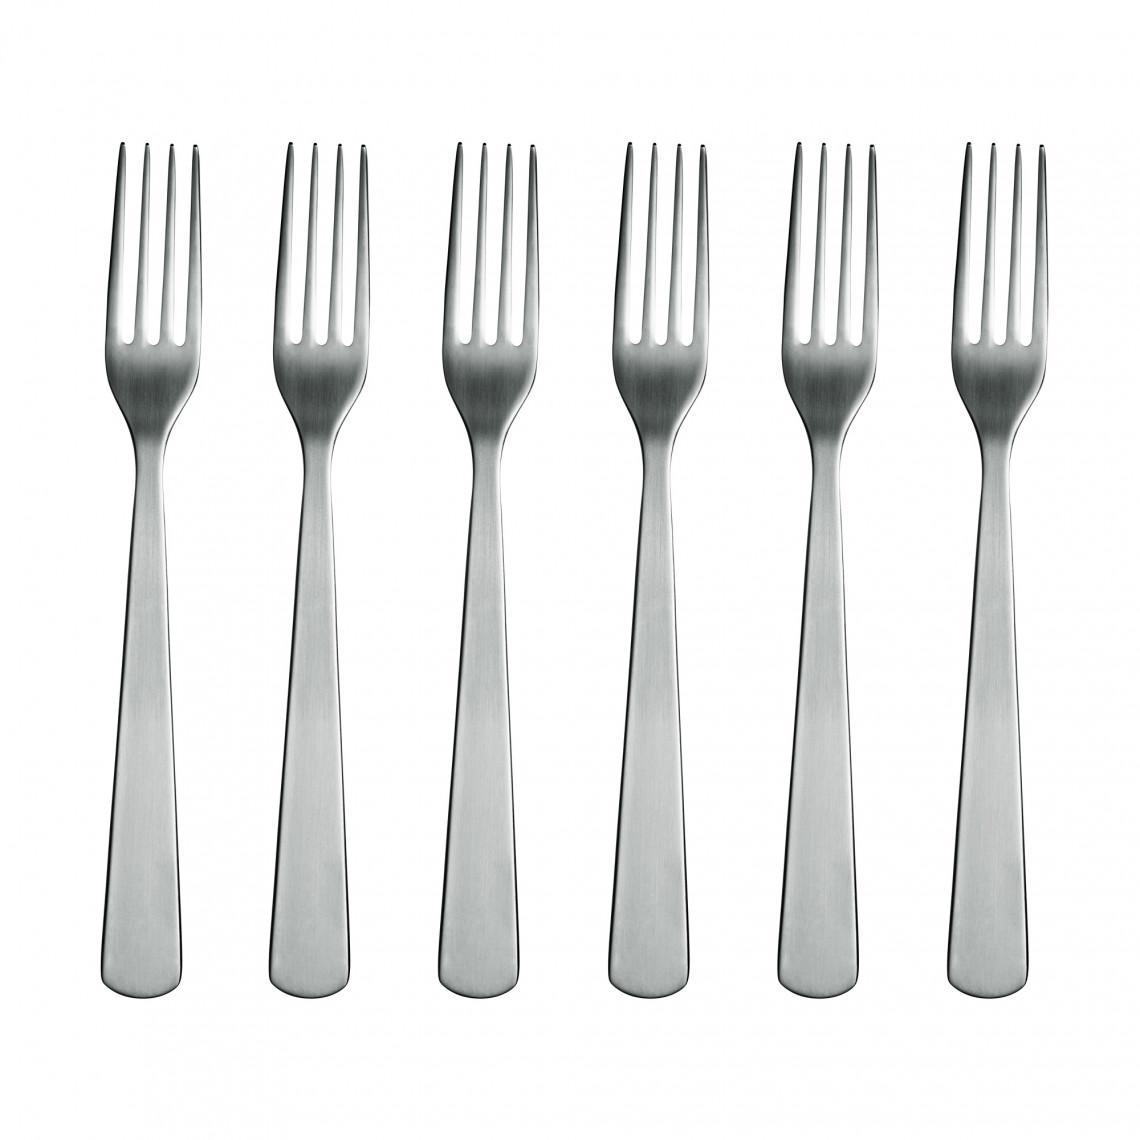 Gafflar Normann Cutlery Forks - 6 pack